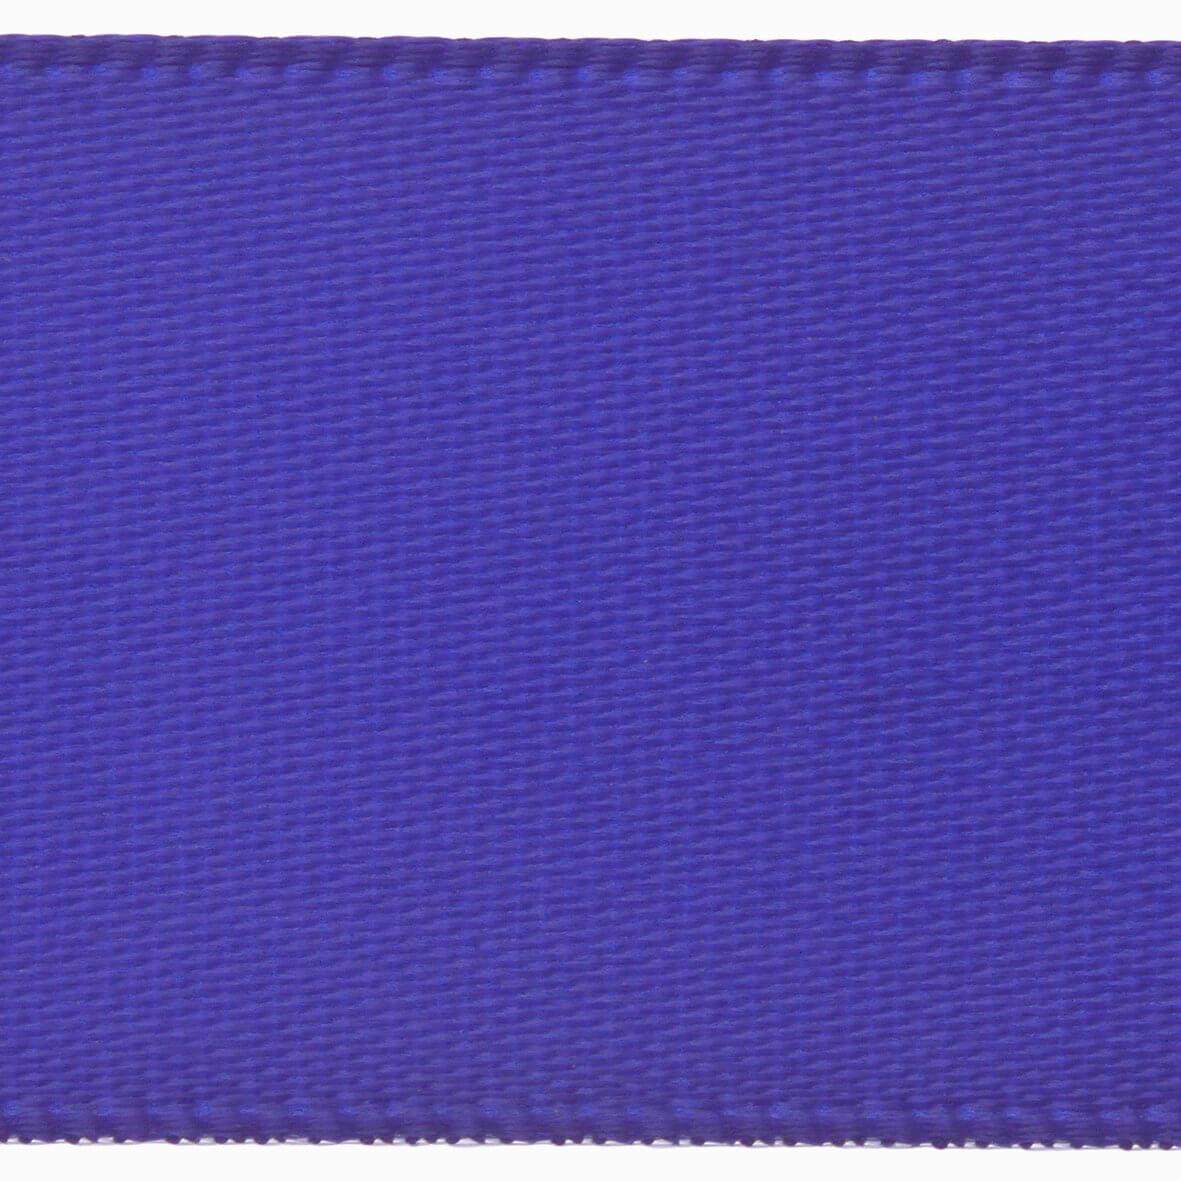 Royal Blue Club Green 23mm Double Faced Satin Ribbon